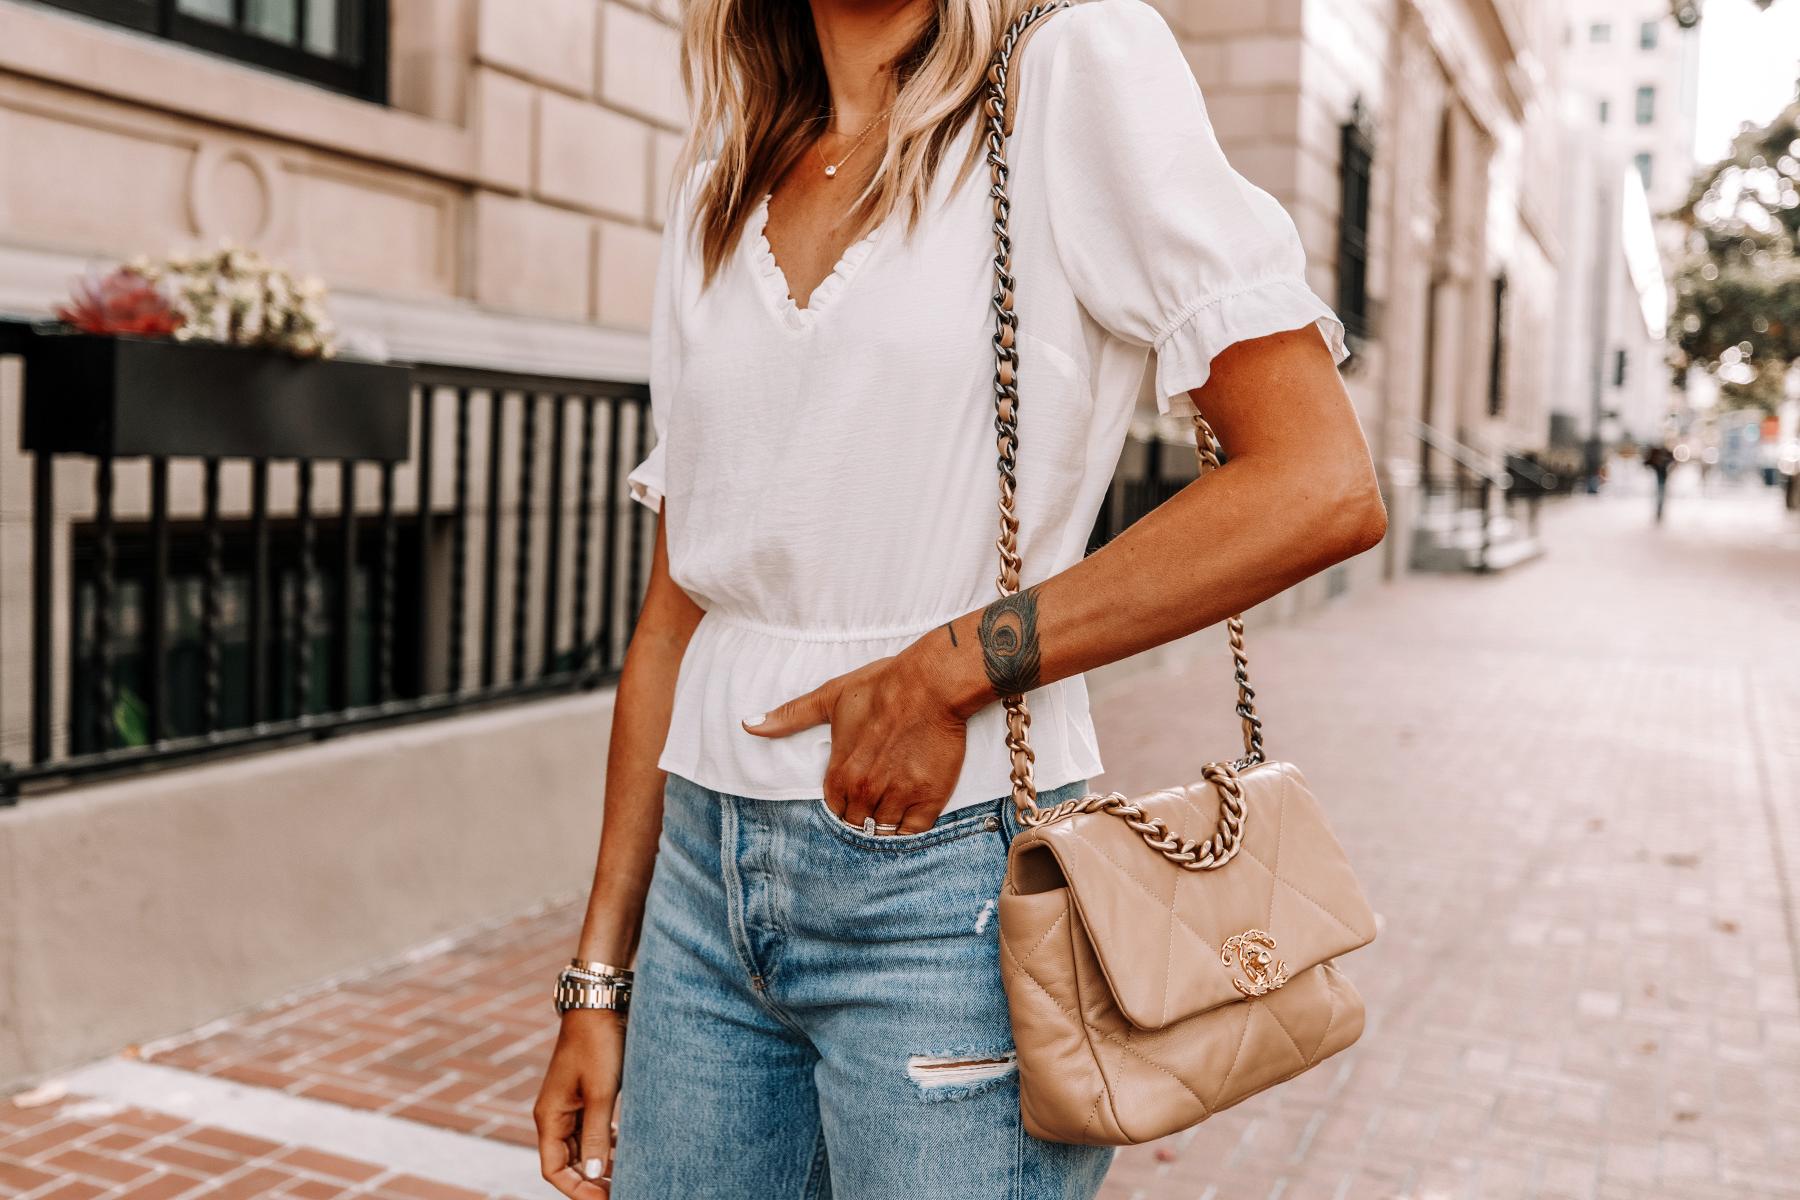 Fashion Jackson Wearing Topshop White Peplum Top Ripped Jeans Chanel 19 Beige Handbag 1